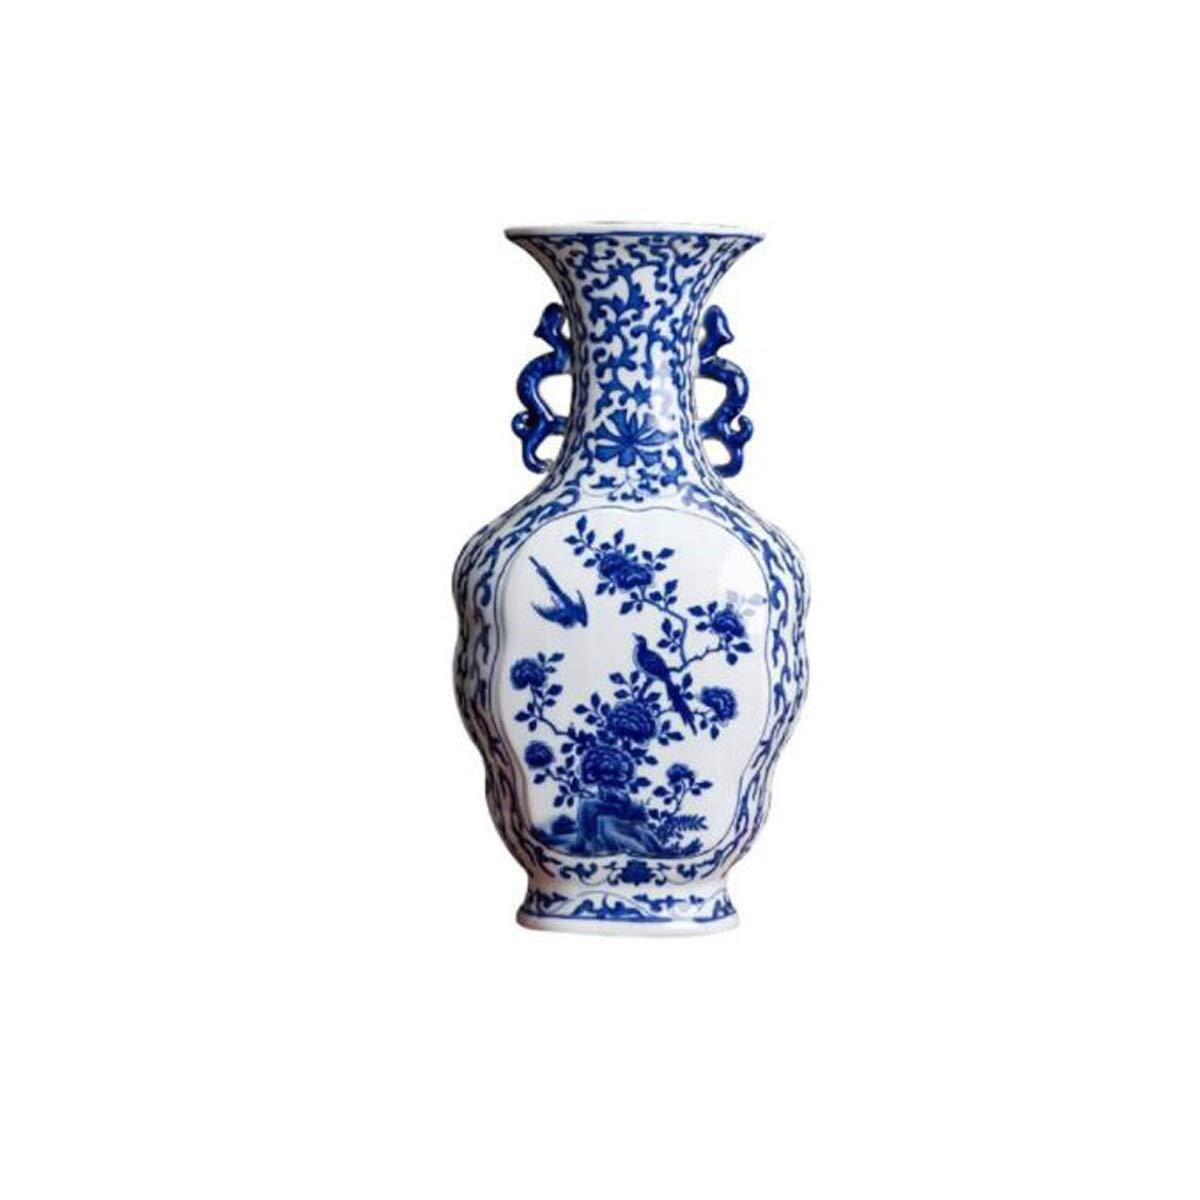 8HAOWENJU 花瓶の装飾、景徳鎮ネオクラシカルな中国の陶芸、青と白のアンティーク花瓶の装飾、リビングルームBoguワインキャビネットホームレトロな装飾、青と白の磁器の瓶 中華風 (Color : Ceramics) B07SSR32LZ Ceramics